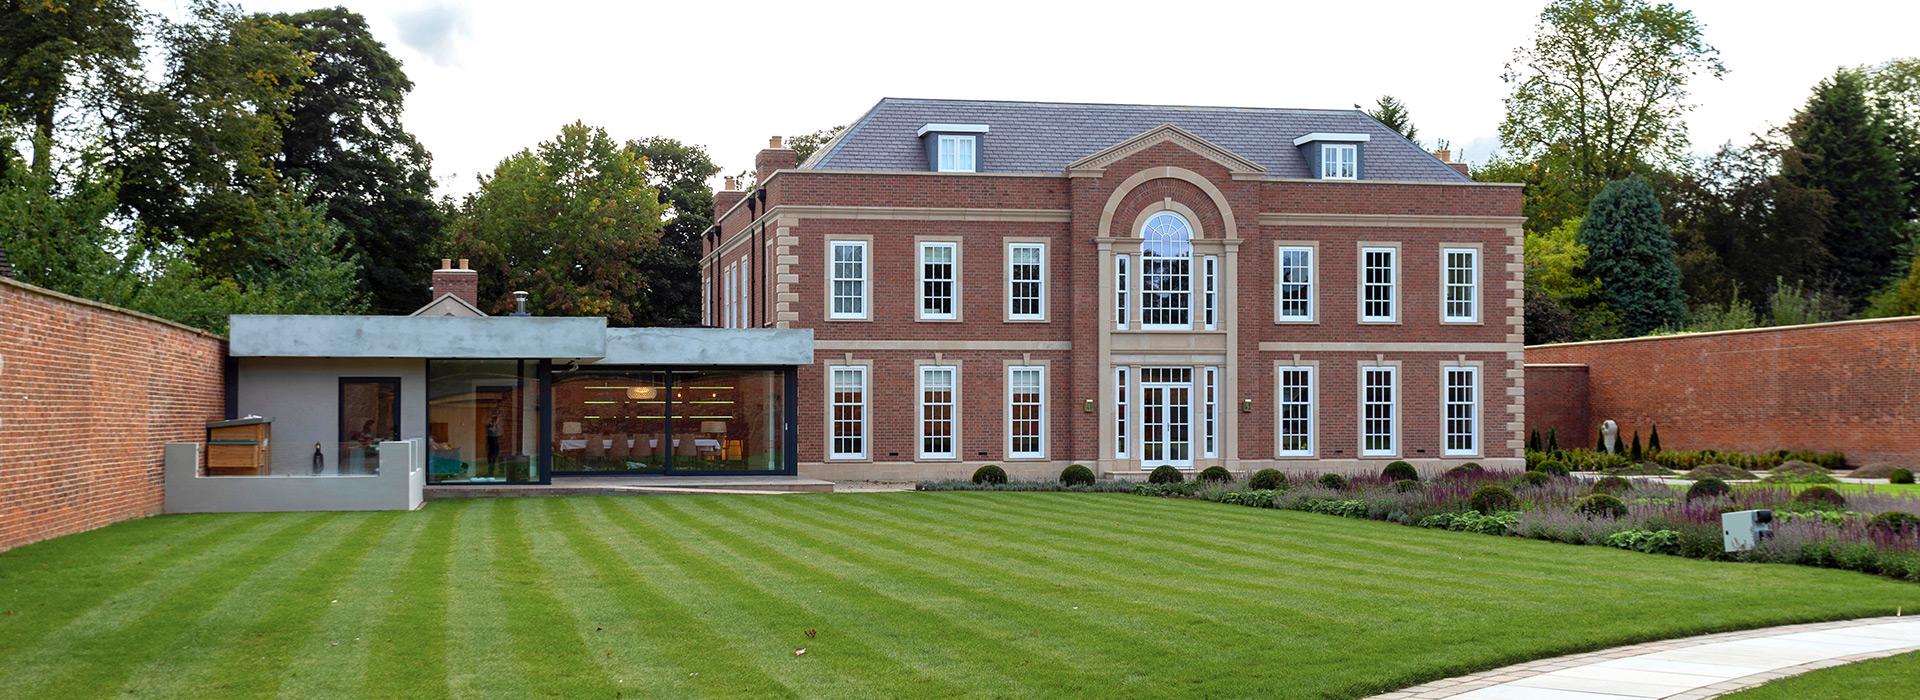 Regency Style Mansion